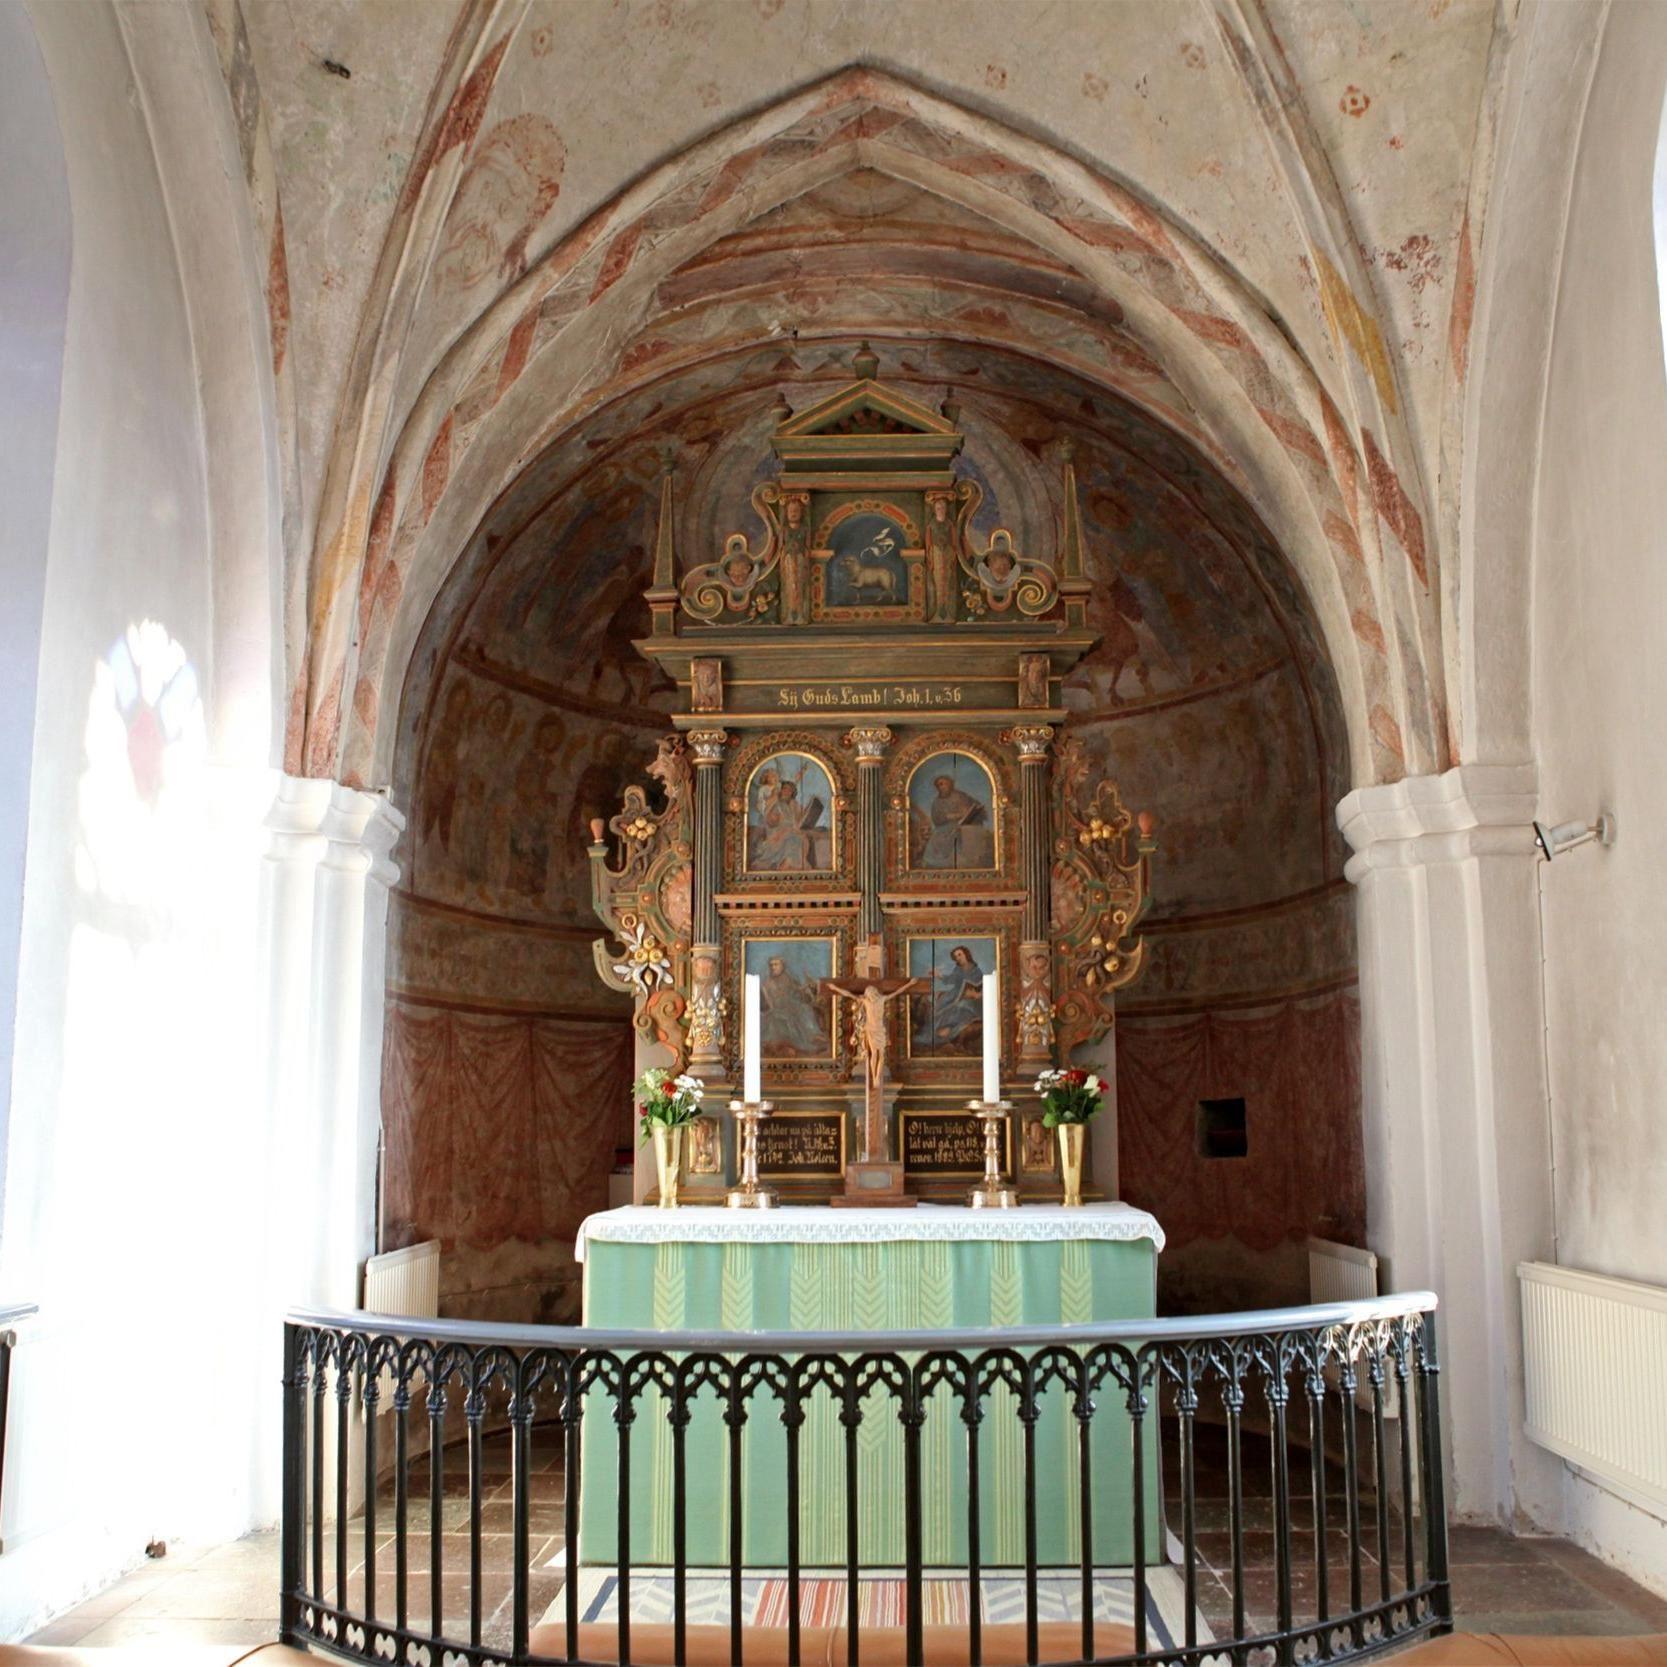 © Kävlinge kommun, Lackalänga Kirche